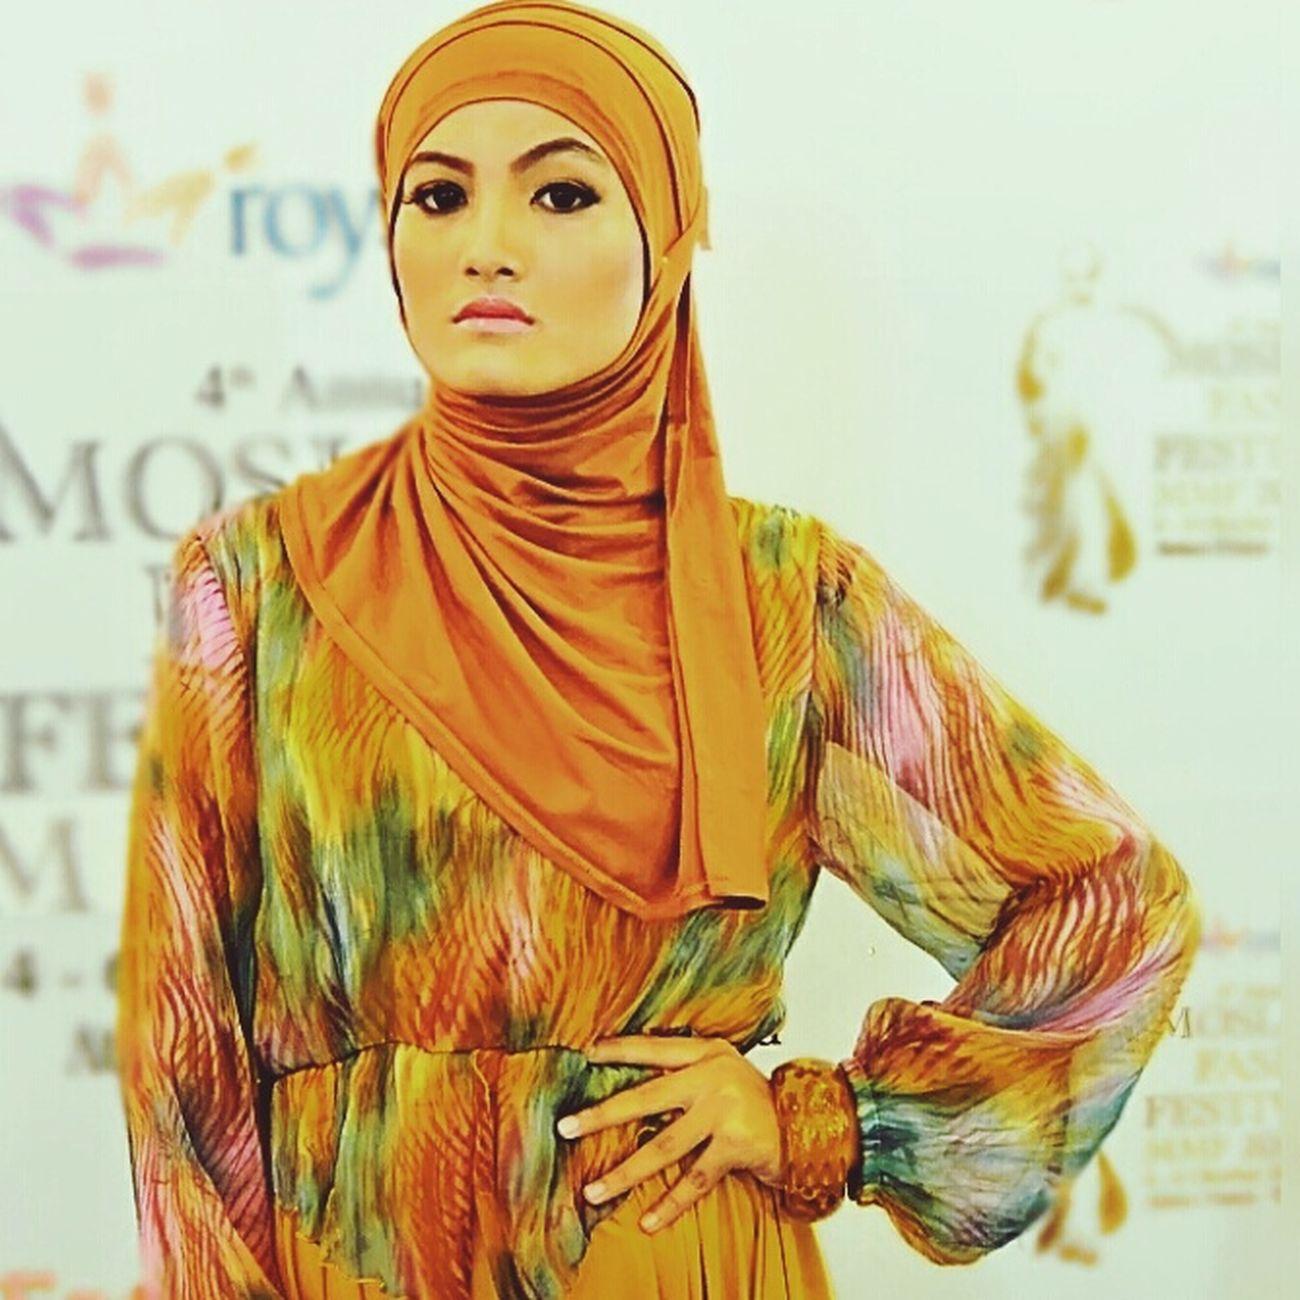 Model Muslim Hijabfashion Hijabbeauty Hijabstyle  Amodelssurabaya Muslimstyle Muslimahfashion Www.amanagementsby.web.id simply elegance bunga   model: bunga   MUA & hijab: adie a iskandar